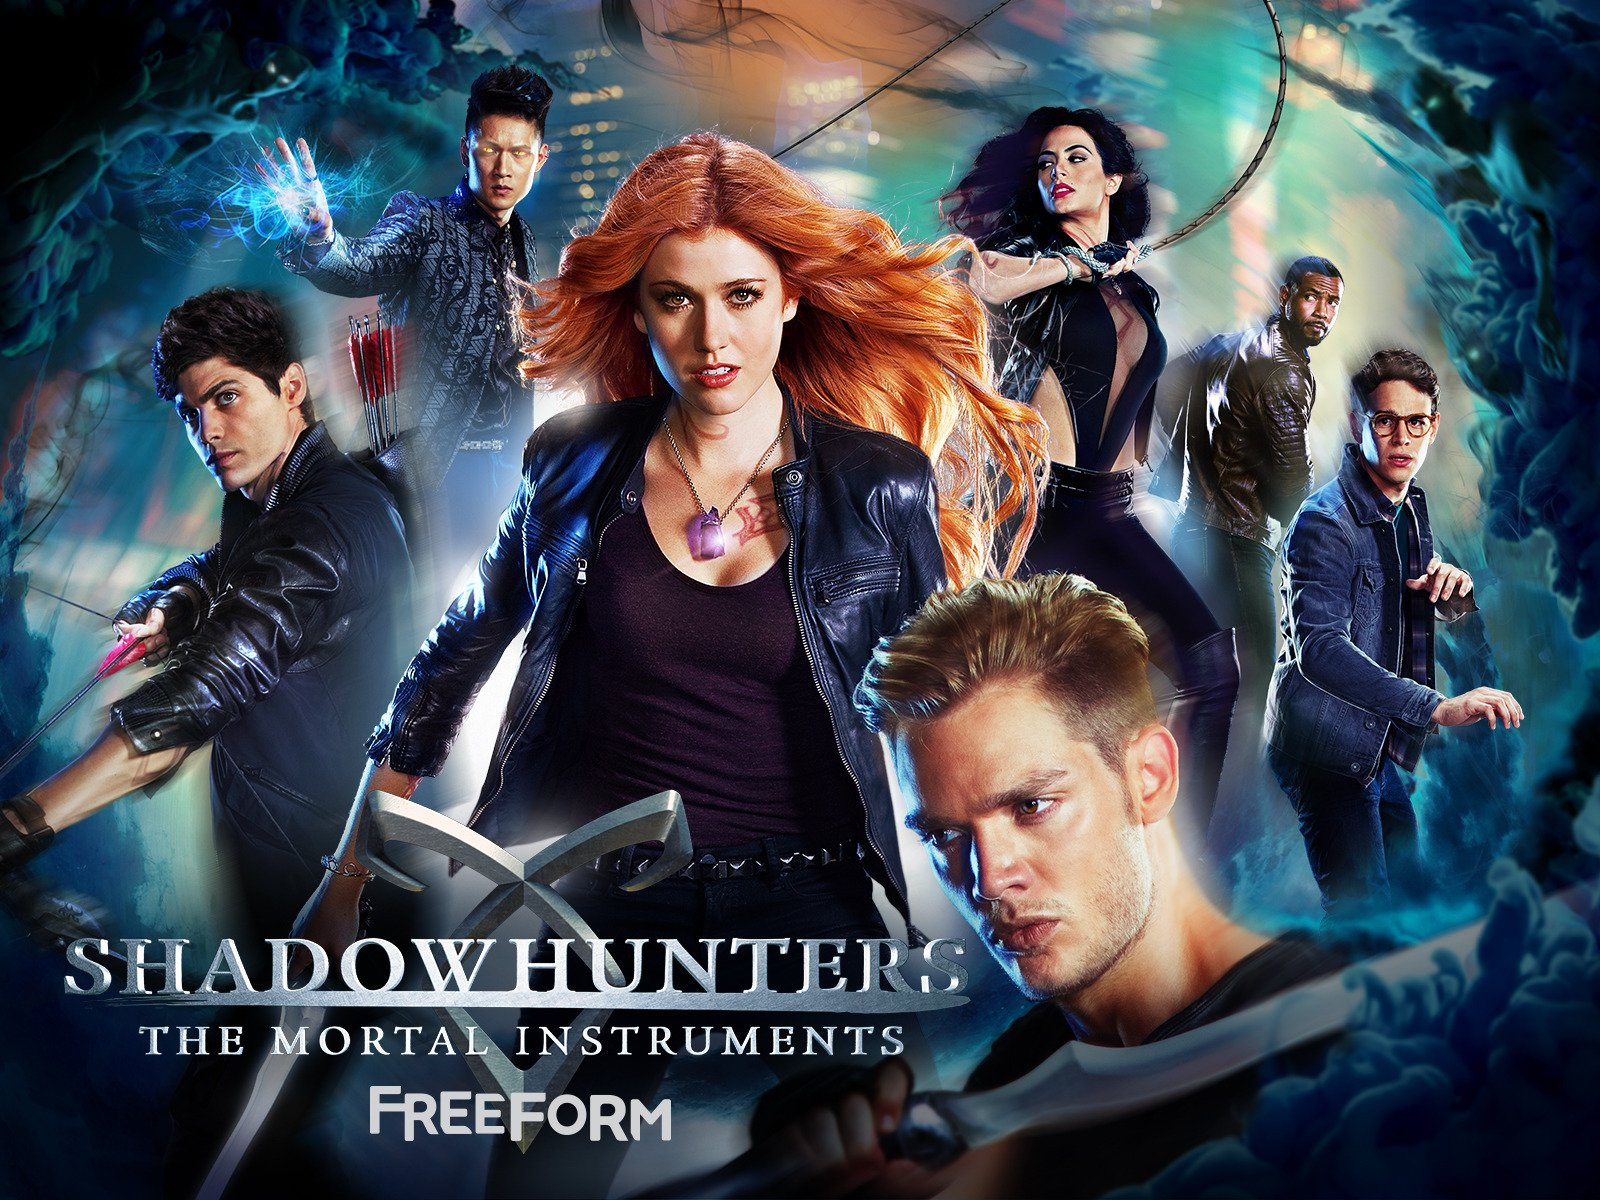 shadowhunters season 1 kickass